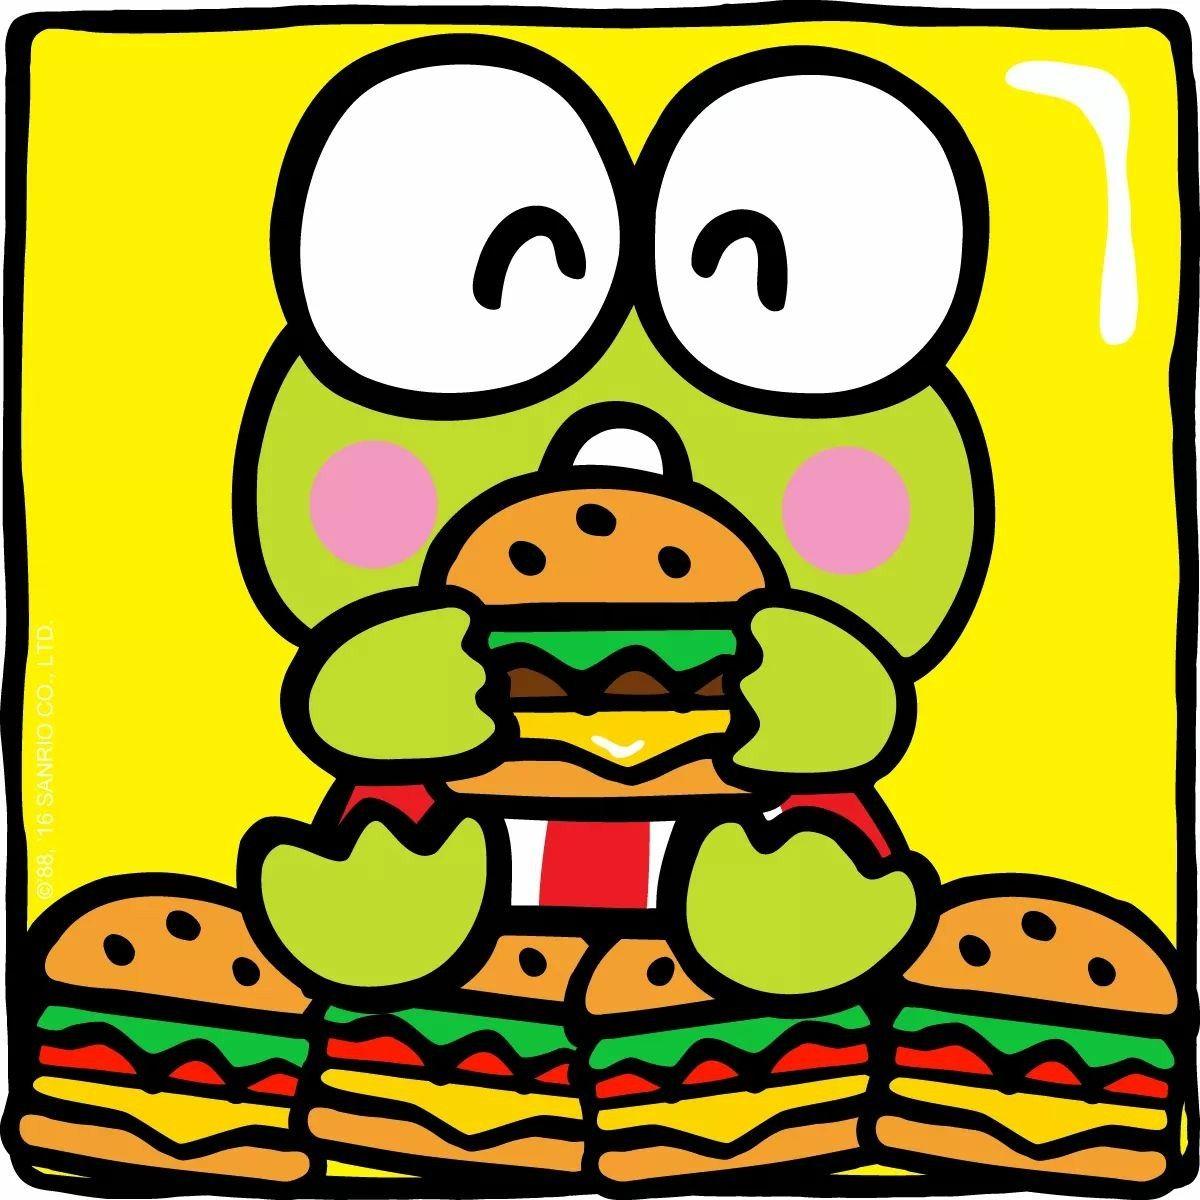 Keroppi Happy National Cheeseburger Day